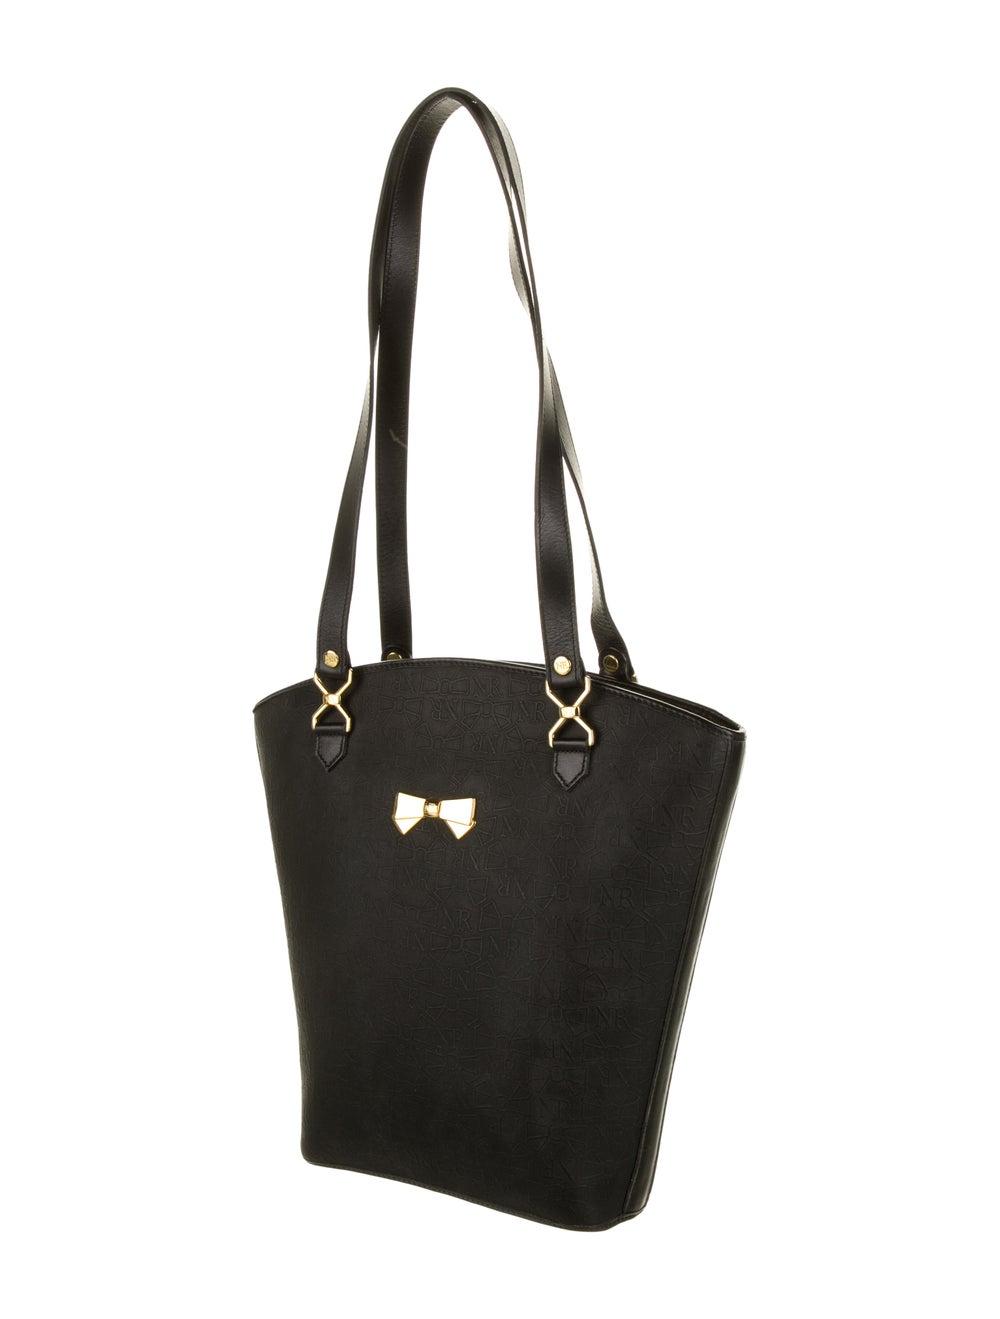 Nina Ricci Leather Handle Bag Black - image 3